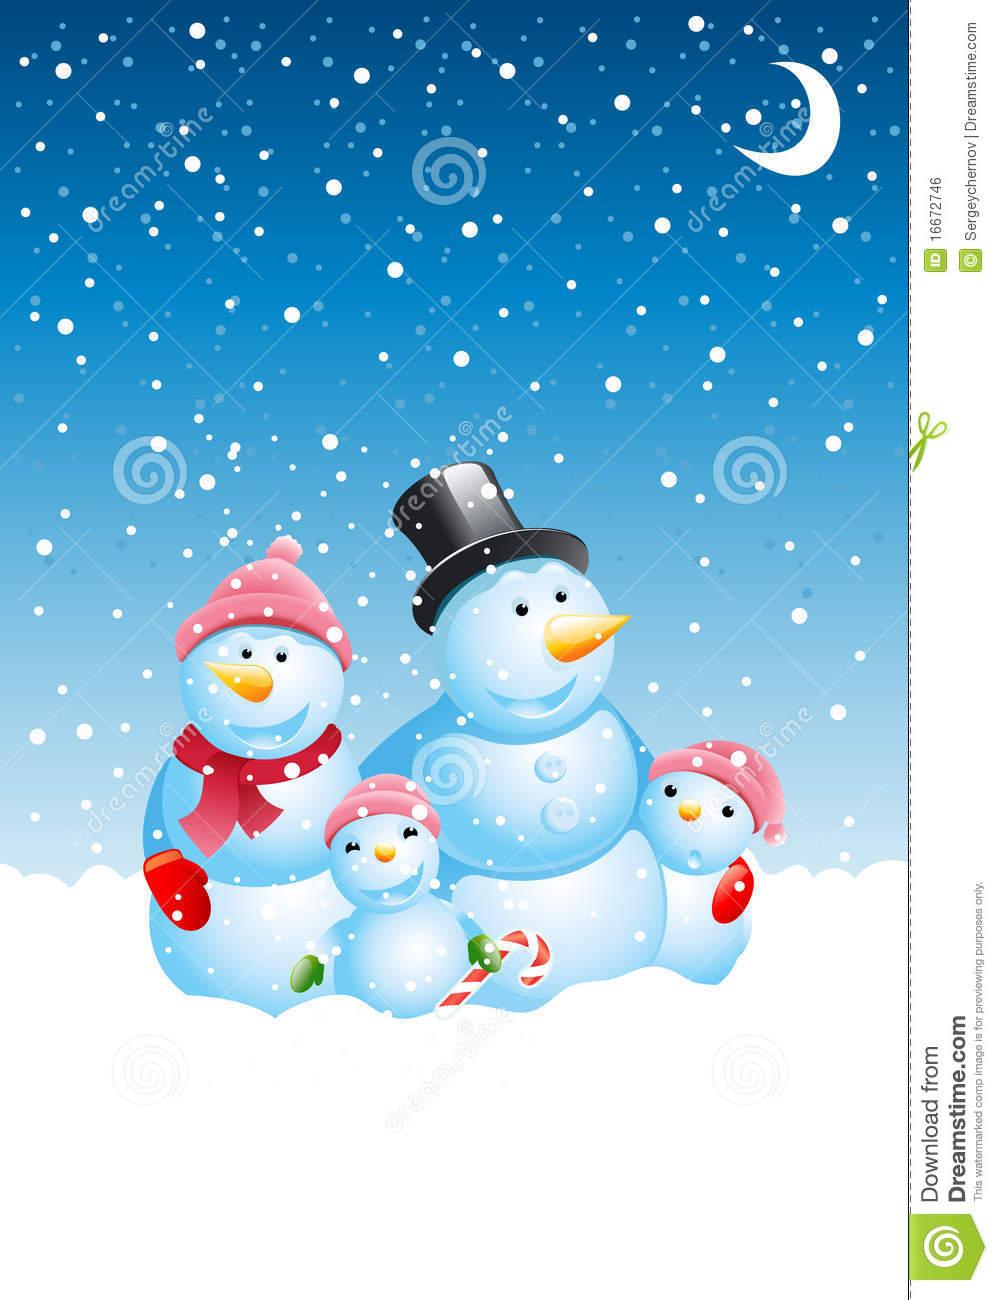 snowman family clip art free - photo #28